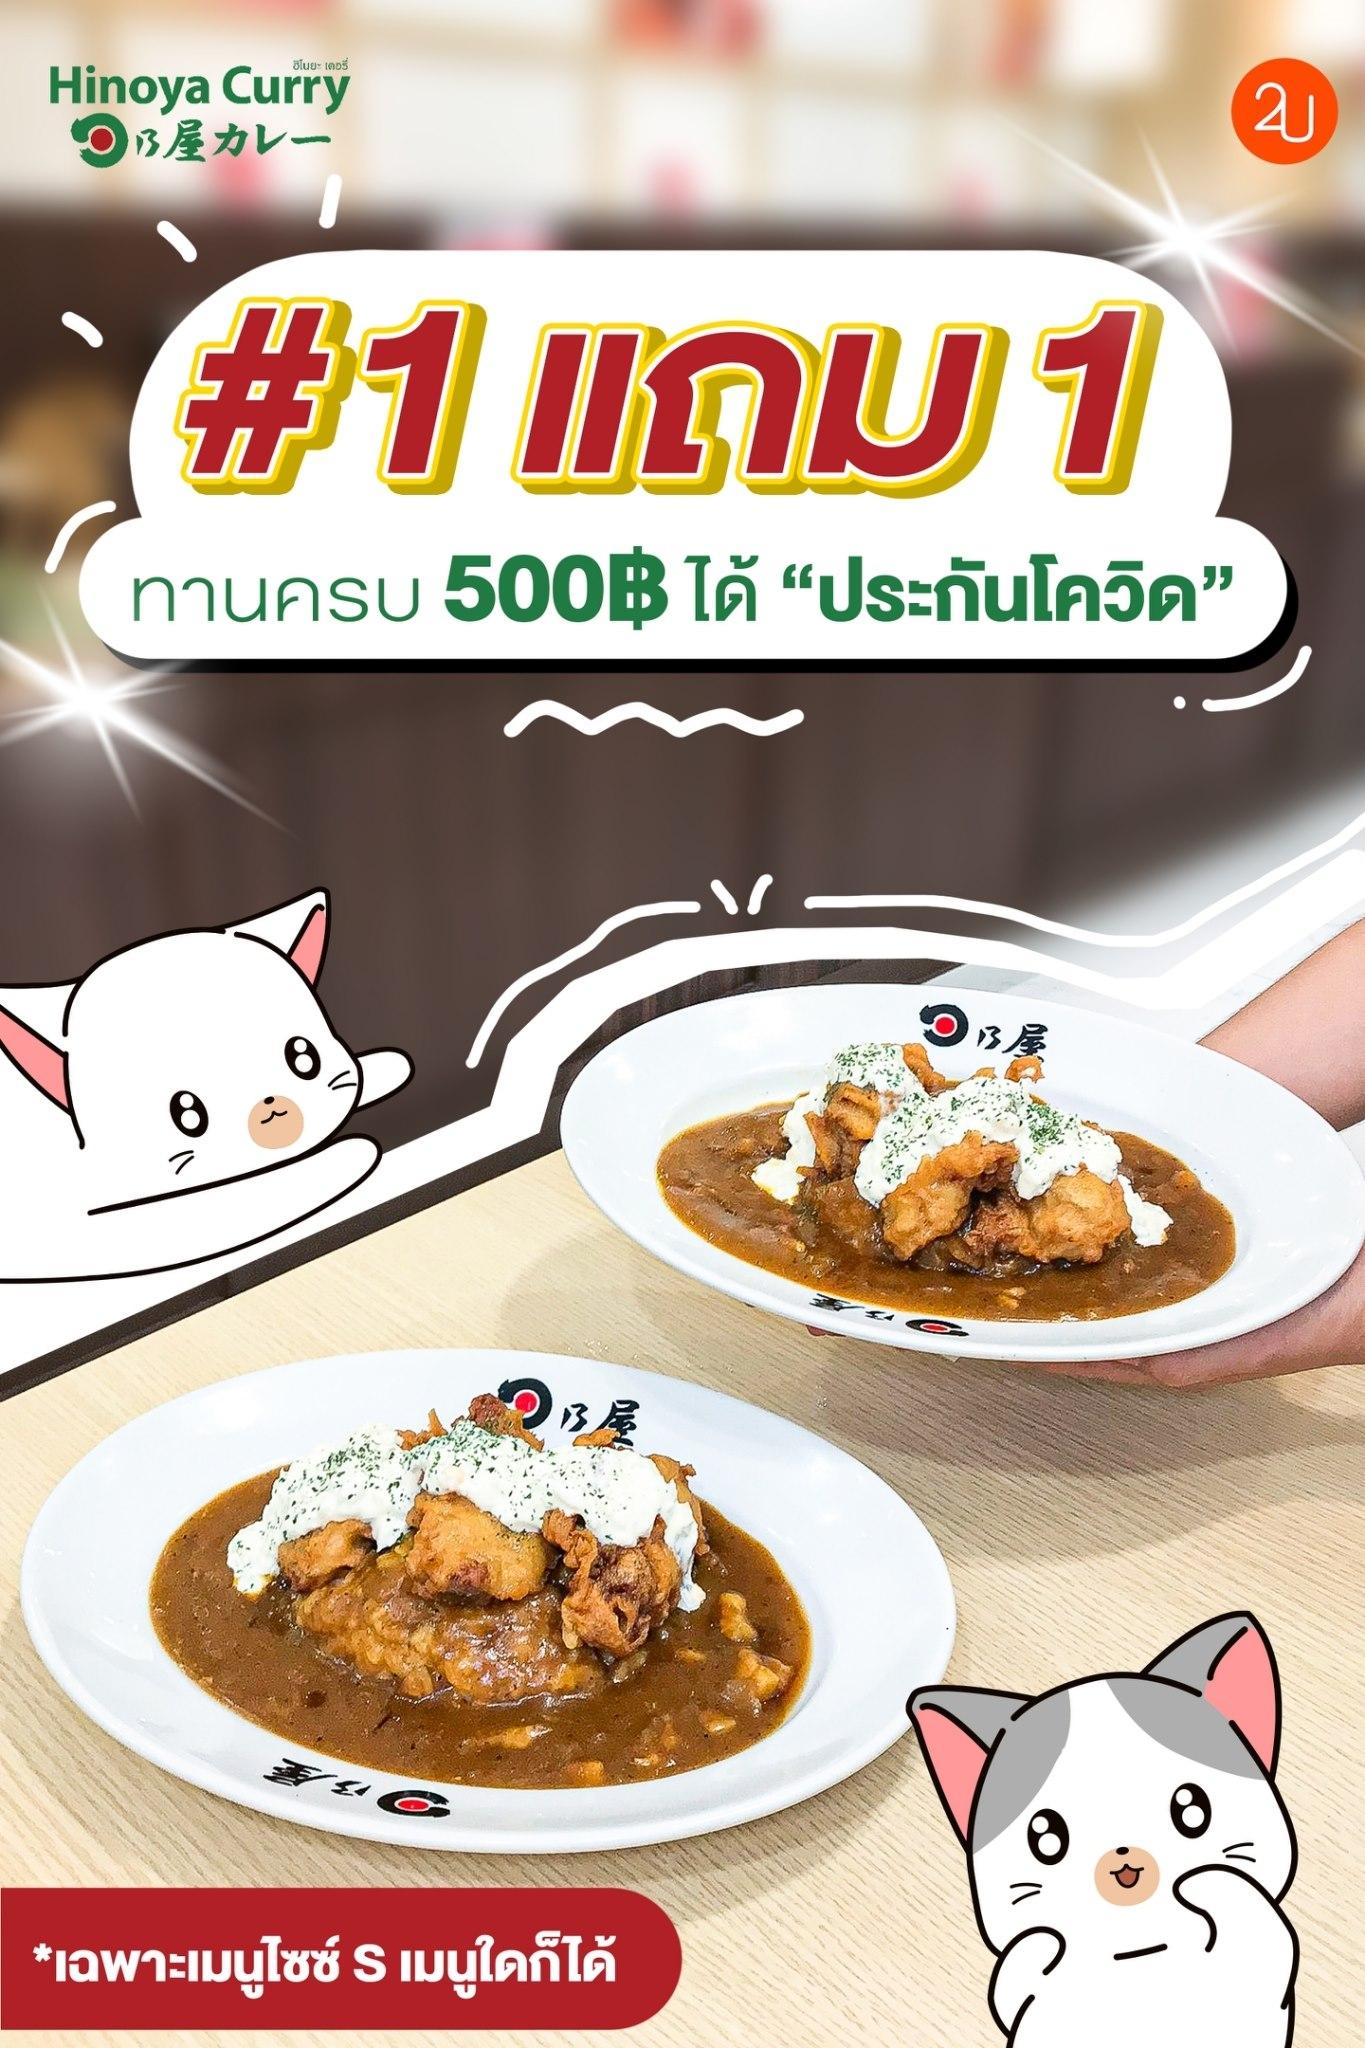 Promotion Hinoya Curry buy 1 free 1